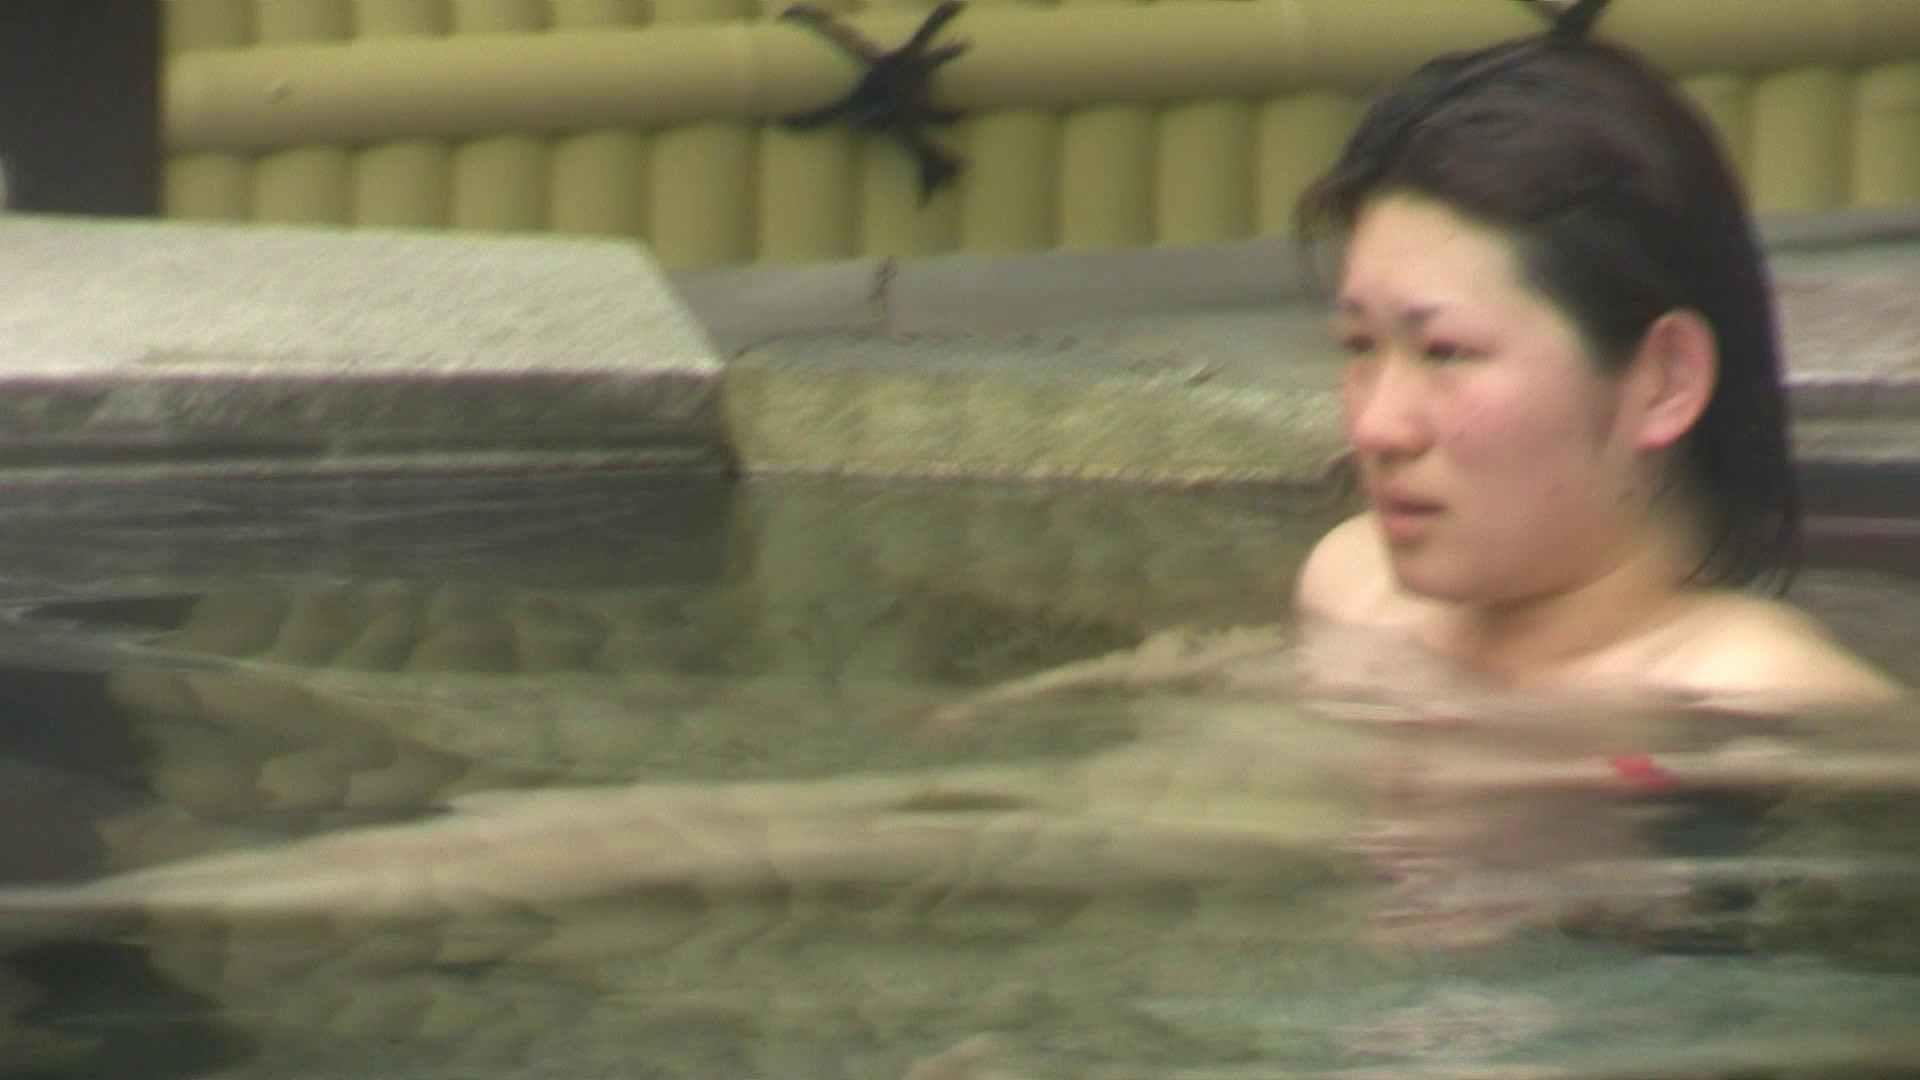 Aquaな露天風呂Vol.673 露天風呂突入 盗み撮り動画キャプチャ 99pic 62